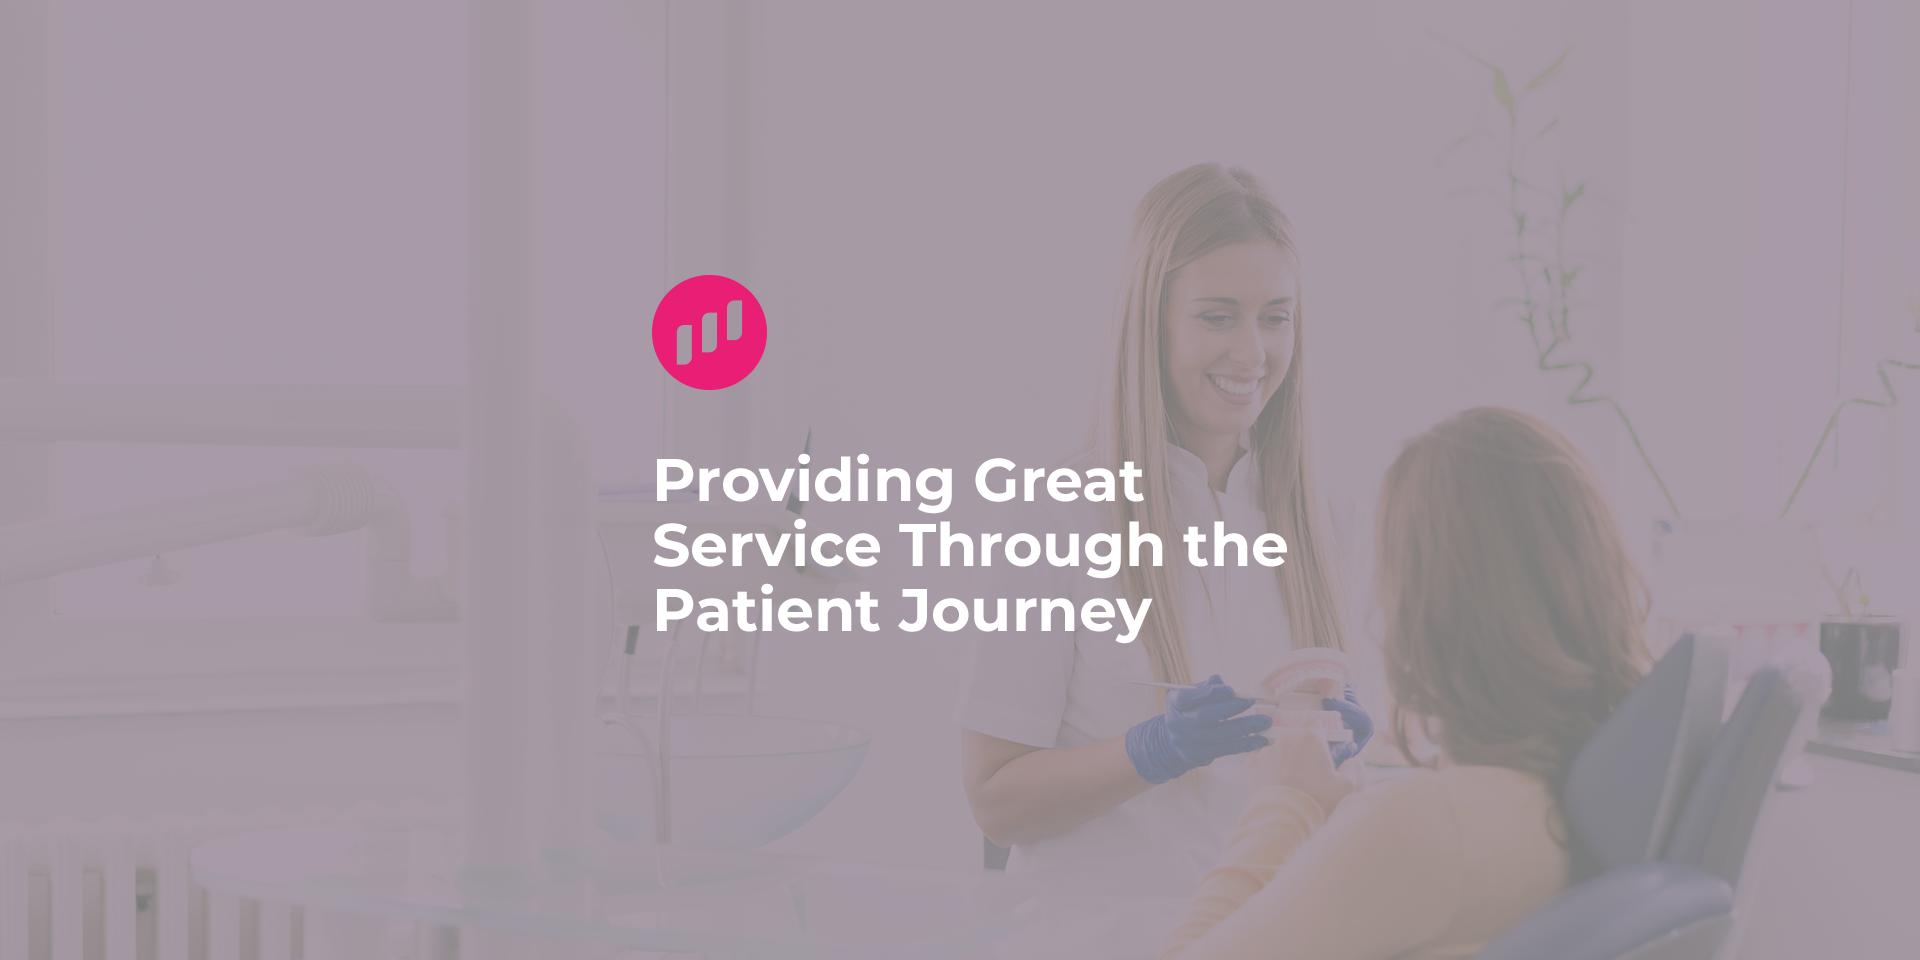 ProvidingGreat Service Through the Patient Journey